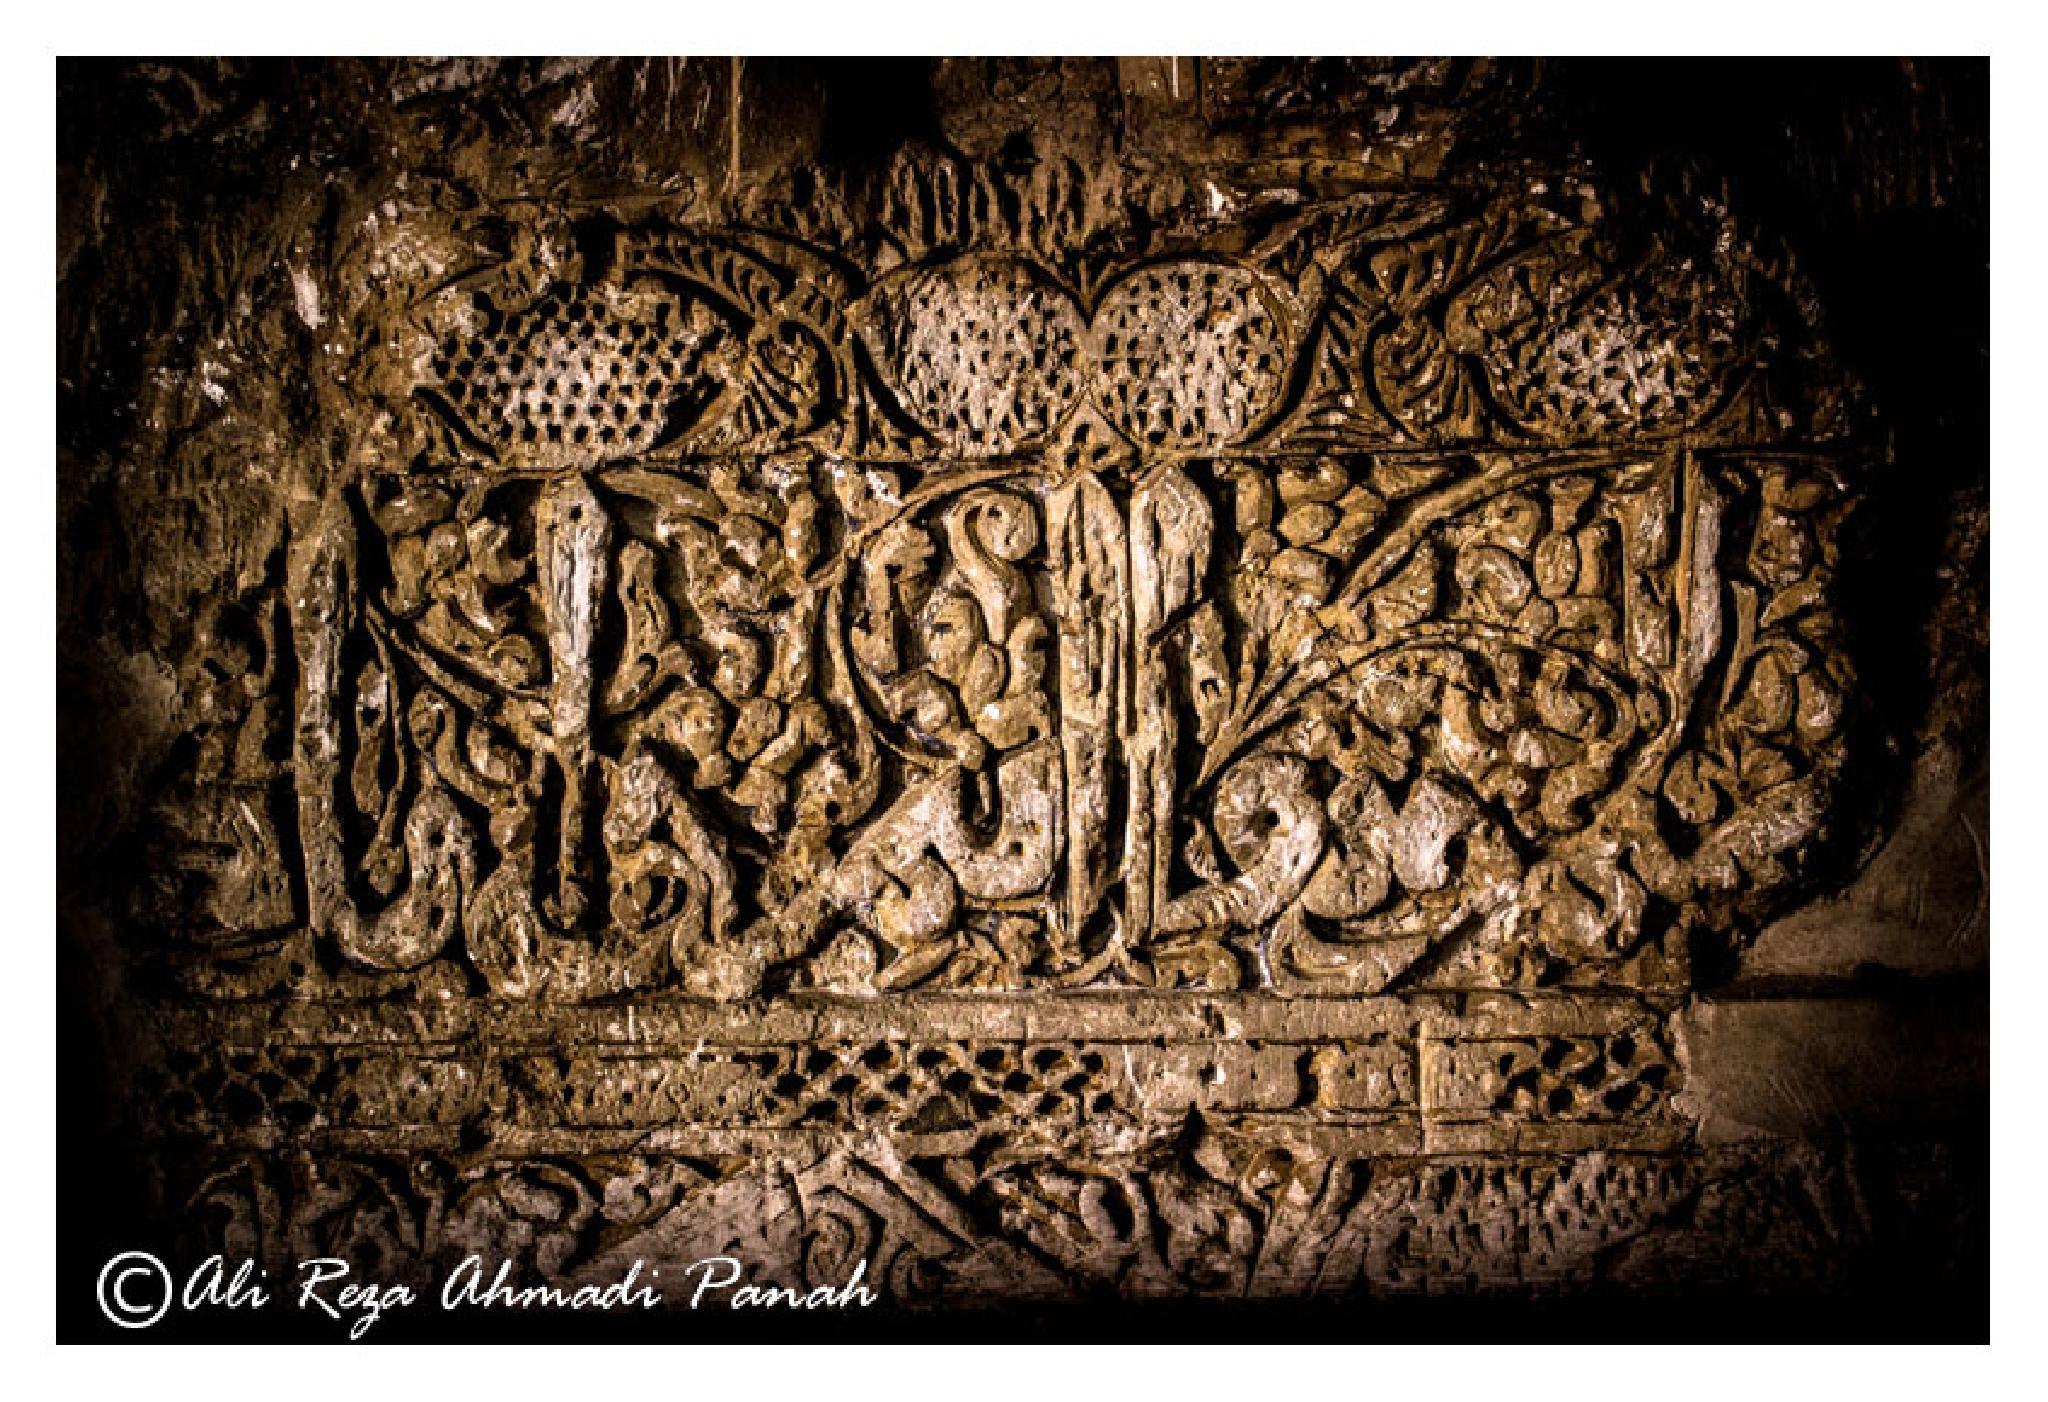 Alavian's tomb in Hamedan, Iran (Gonbad-e-Alavian) by Alireza Ahmadi Panah